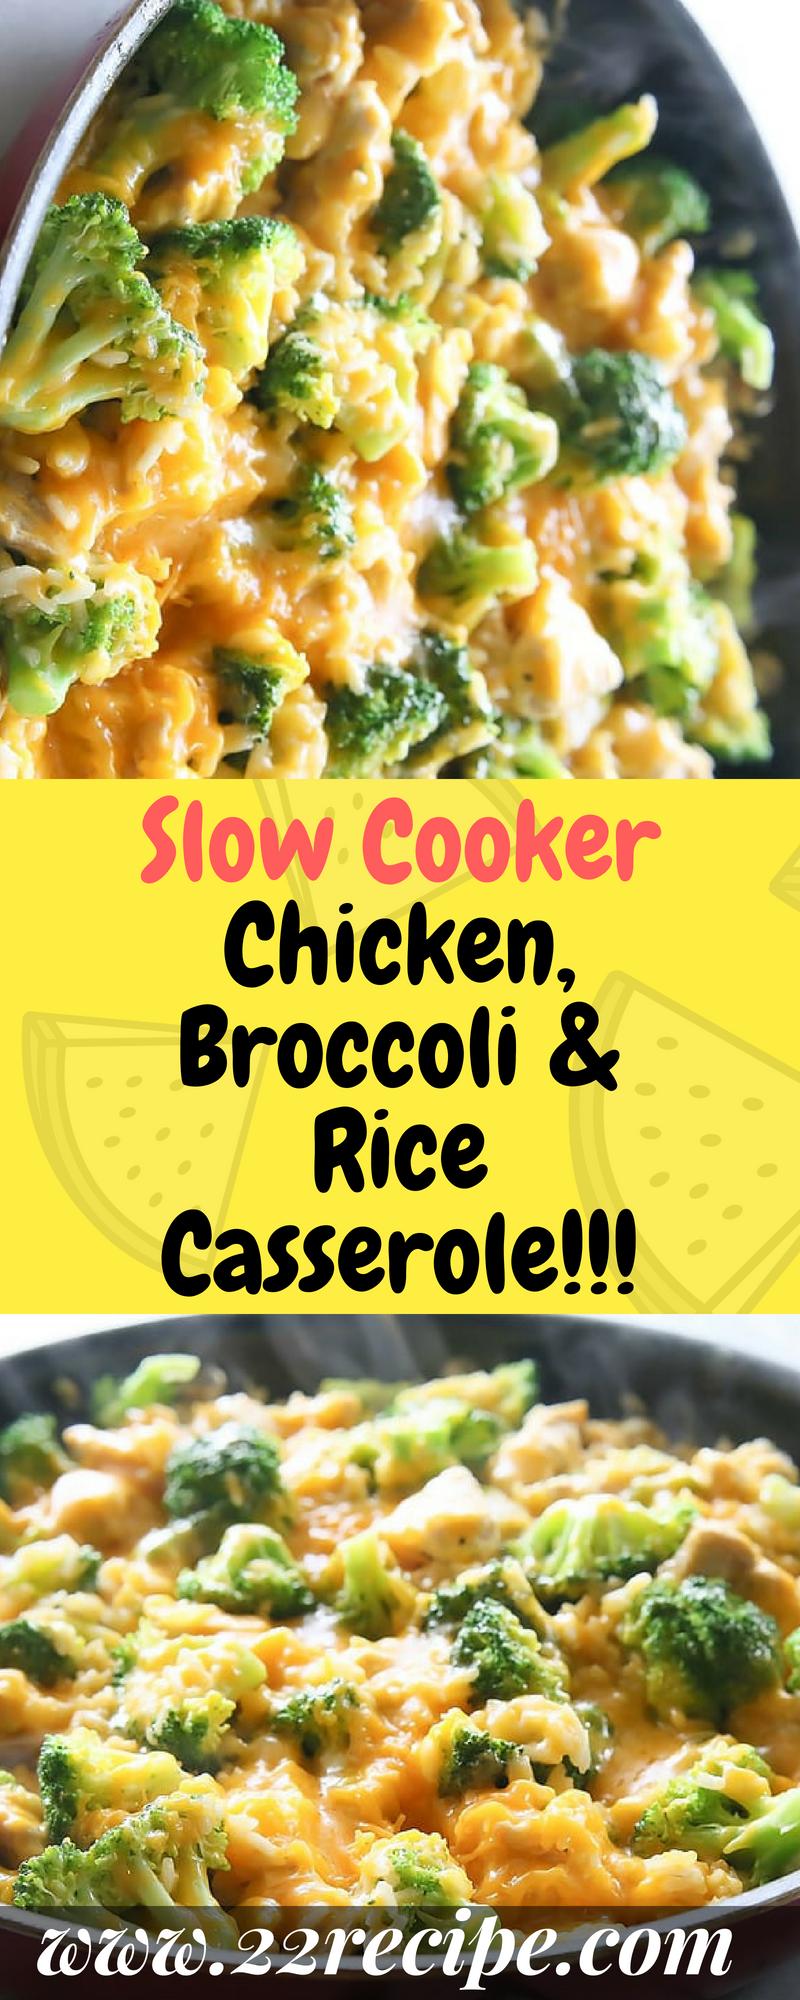 Slow Cooker Chicken, Broccoli  Rice Casserole - 33 -3627